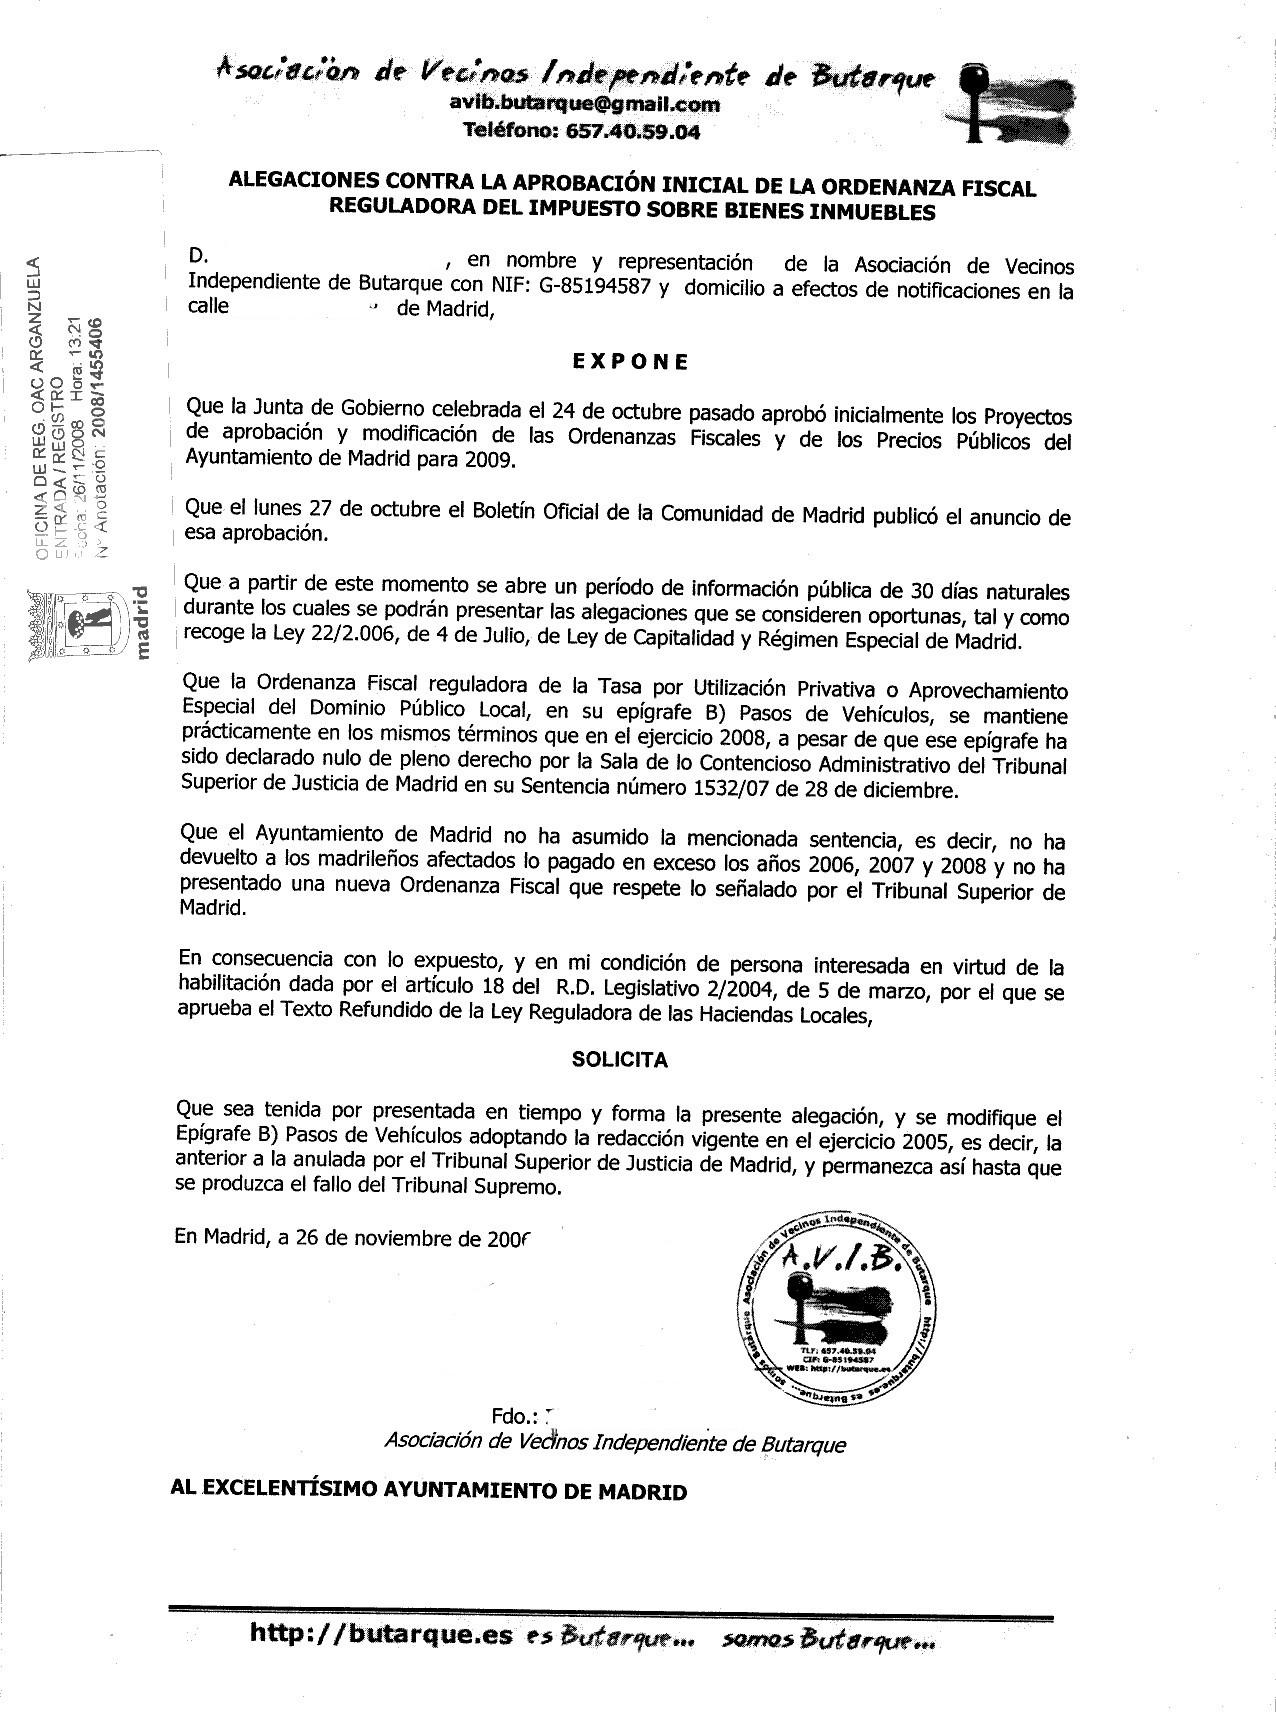 Alegaciones_IBI.jpg